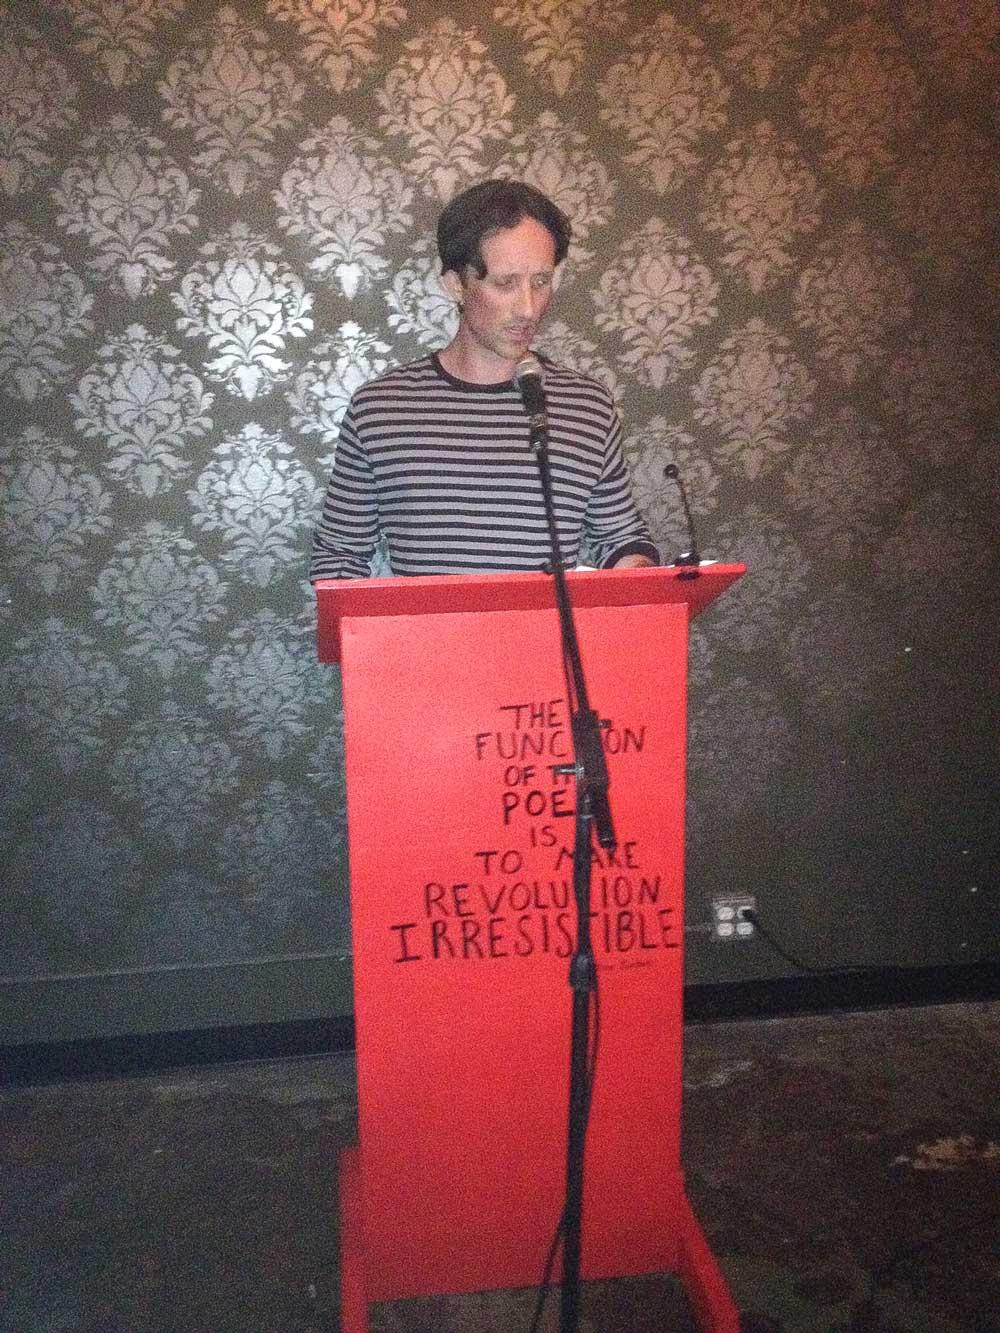 big-yes-press-poet-reading-podium.jpg